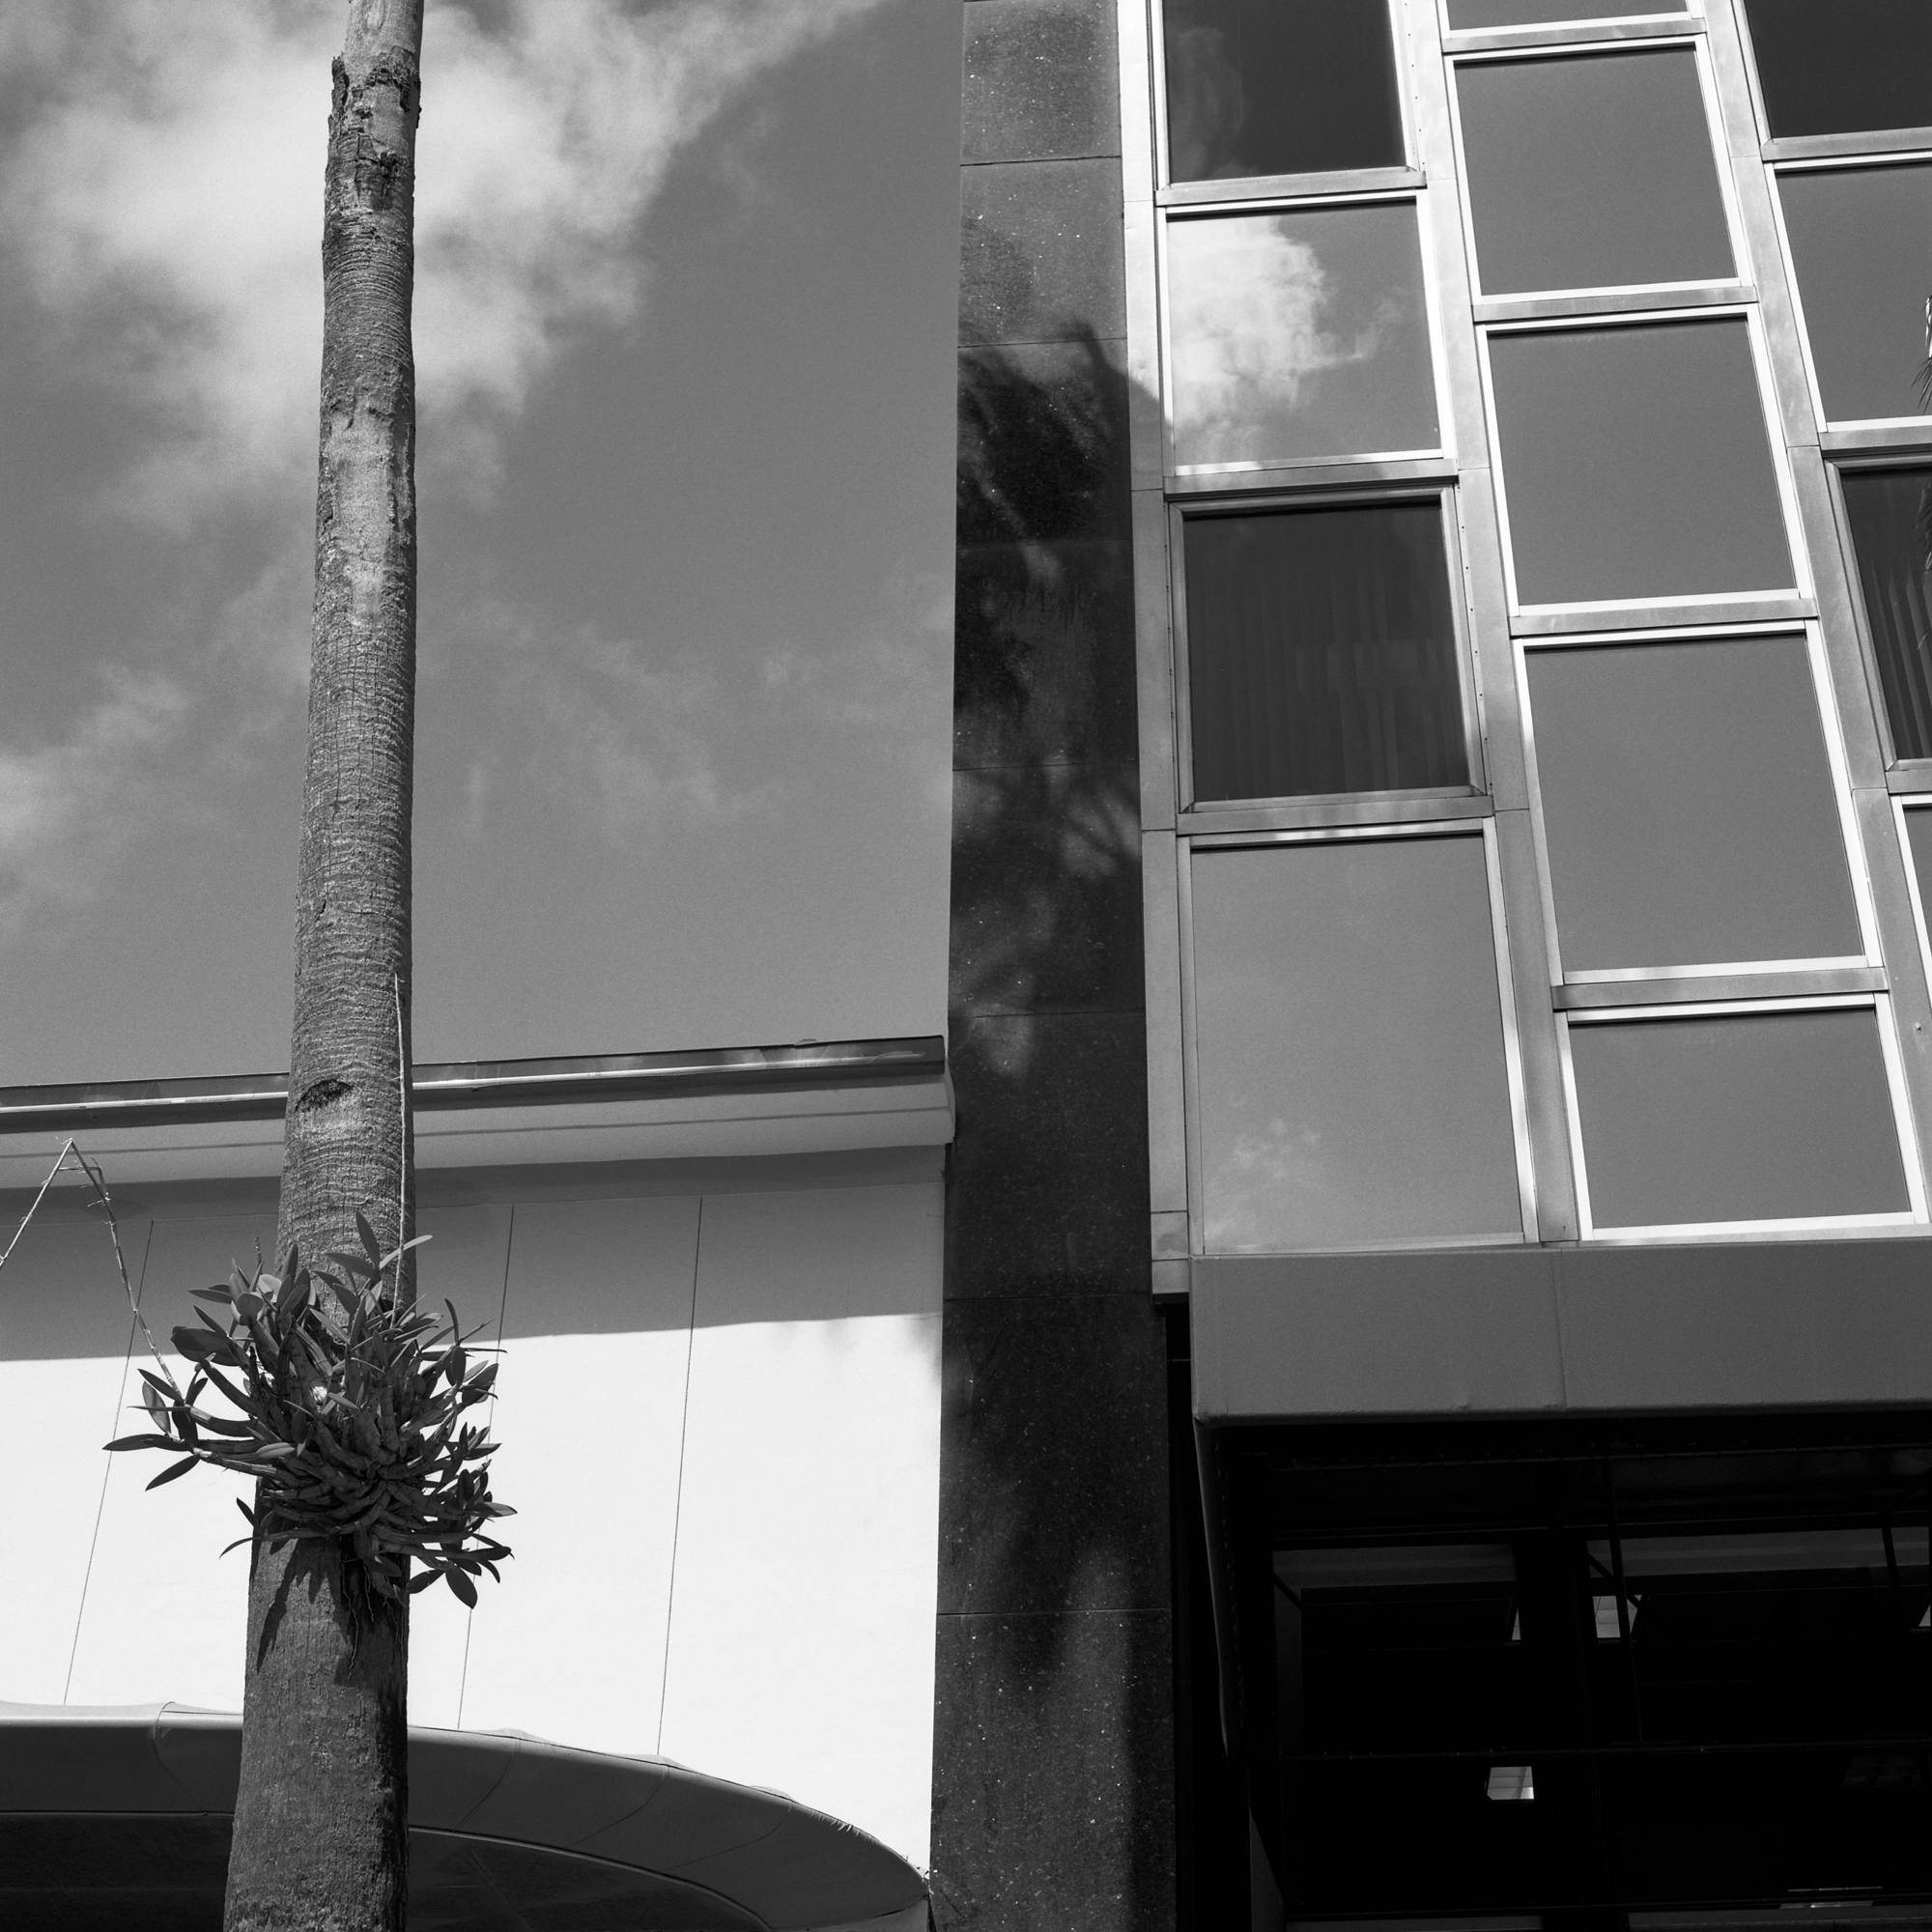 Miami Building & Tree